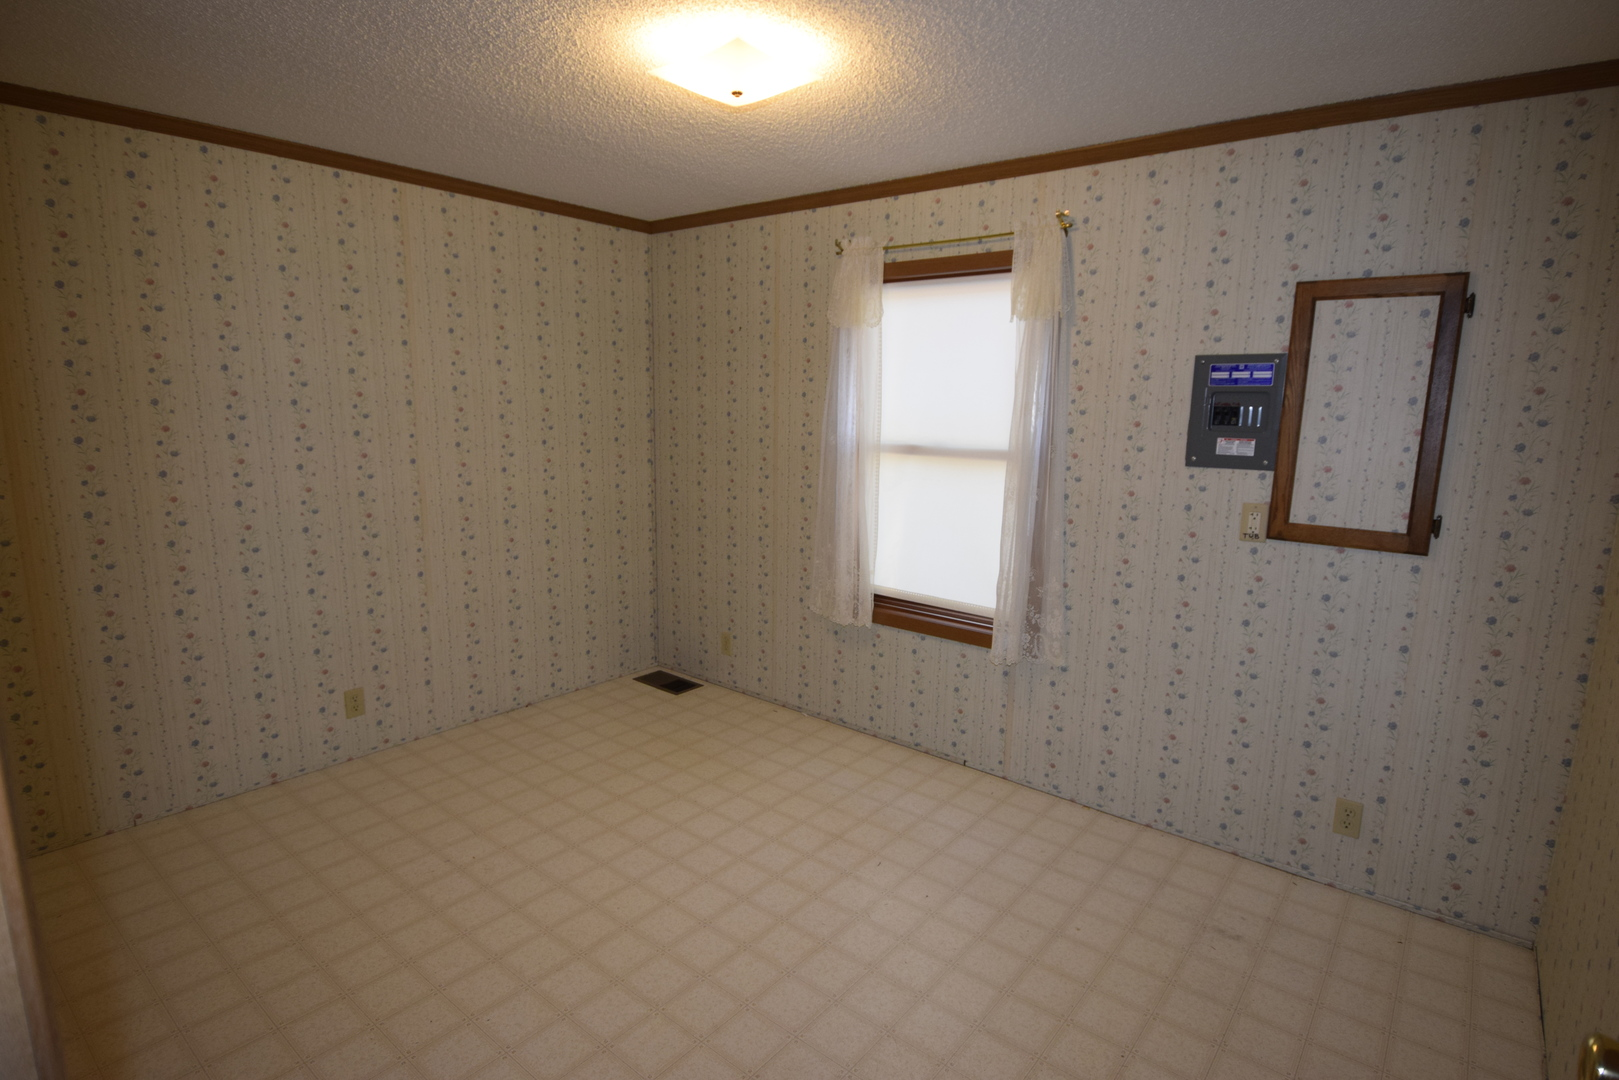 416 Pawnee, Marengo, Illinois, 60152